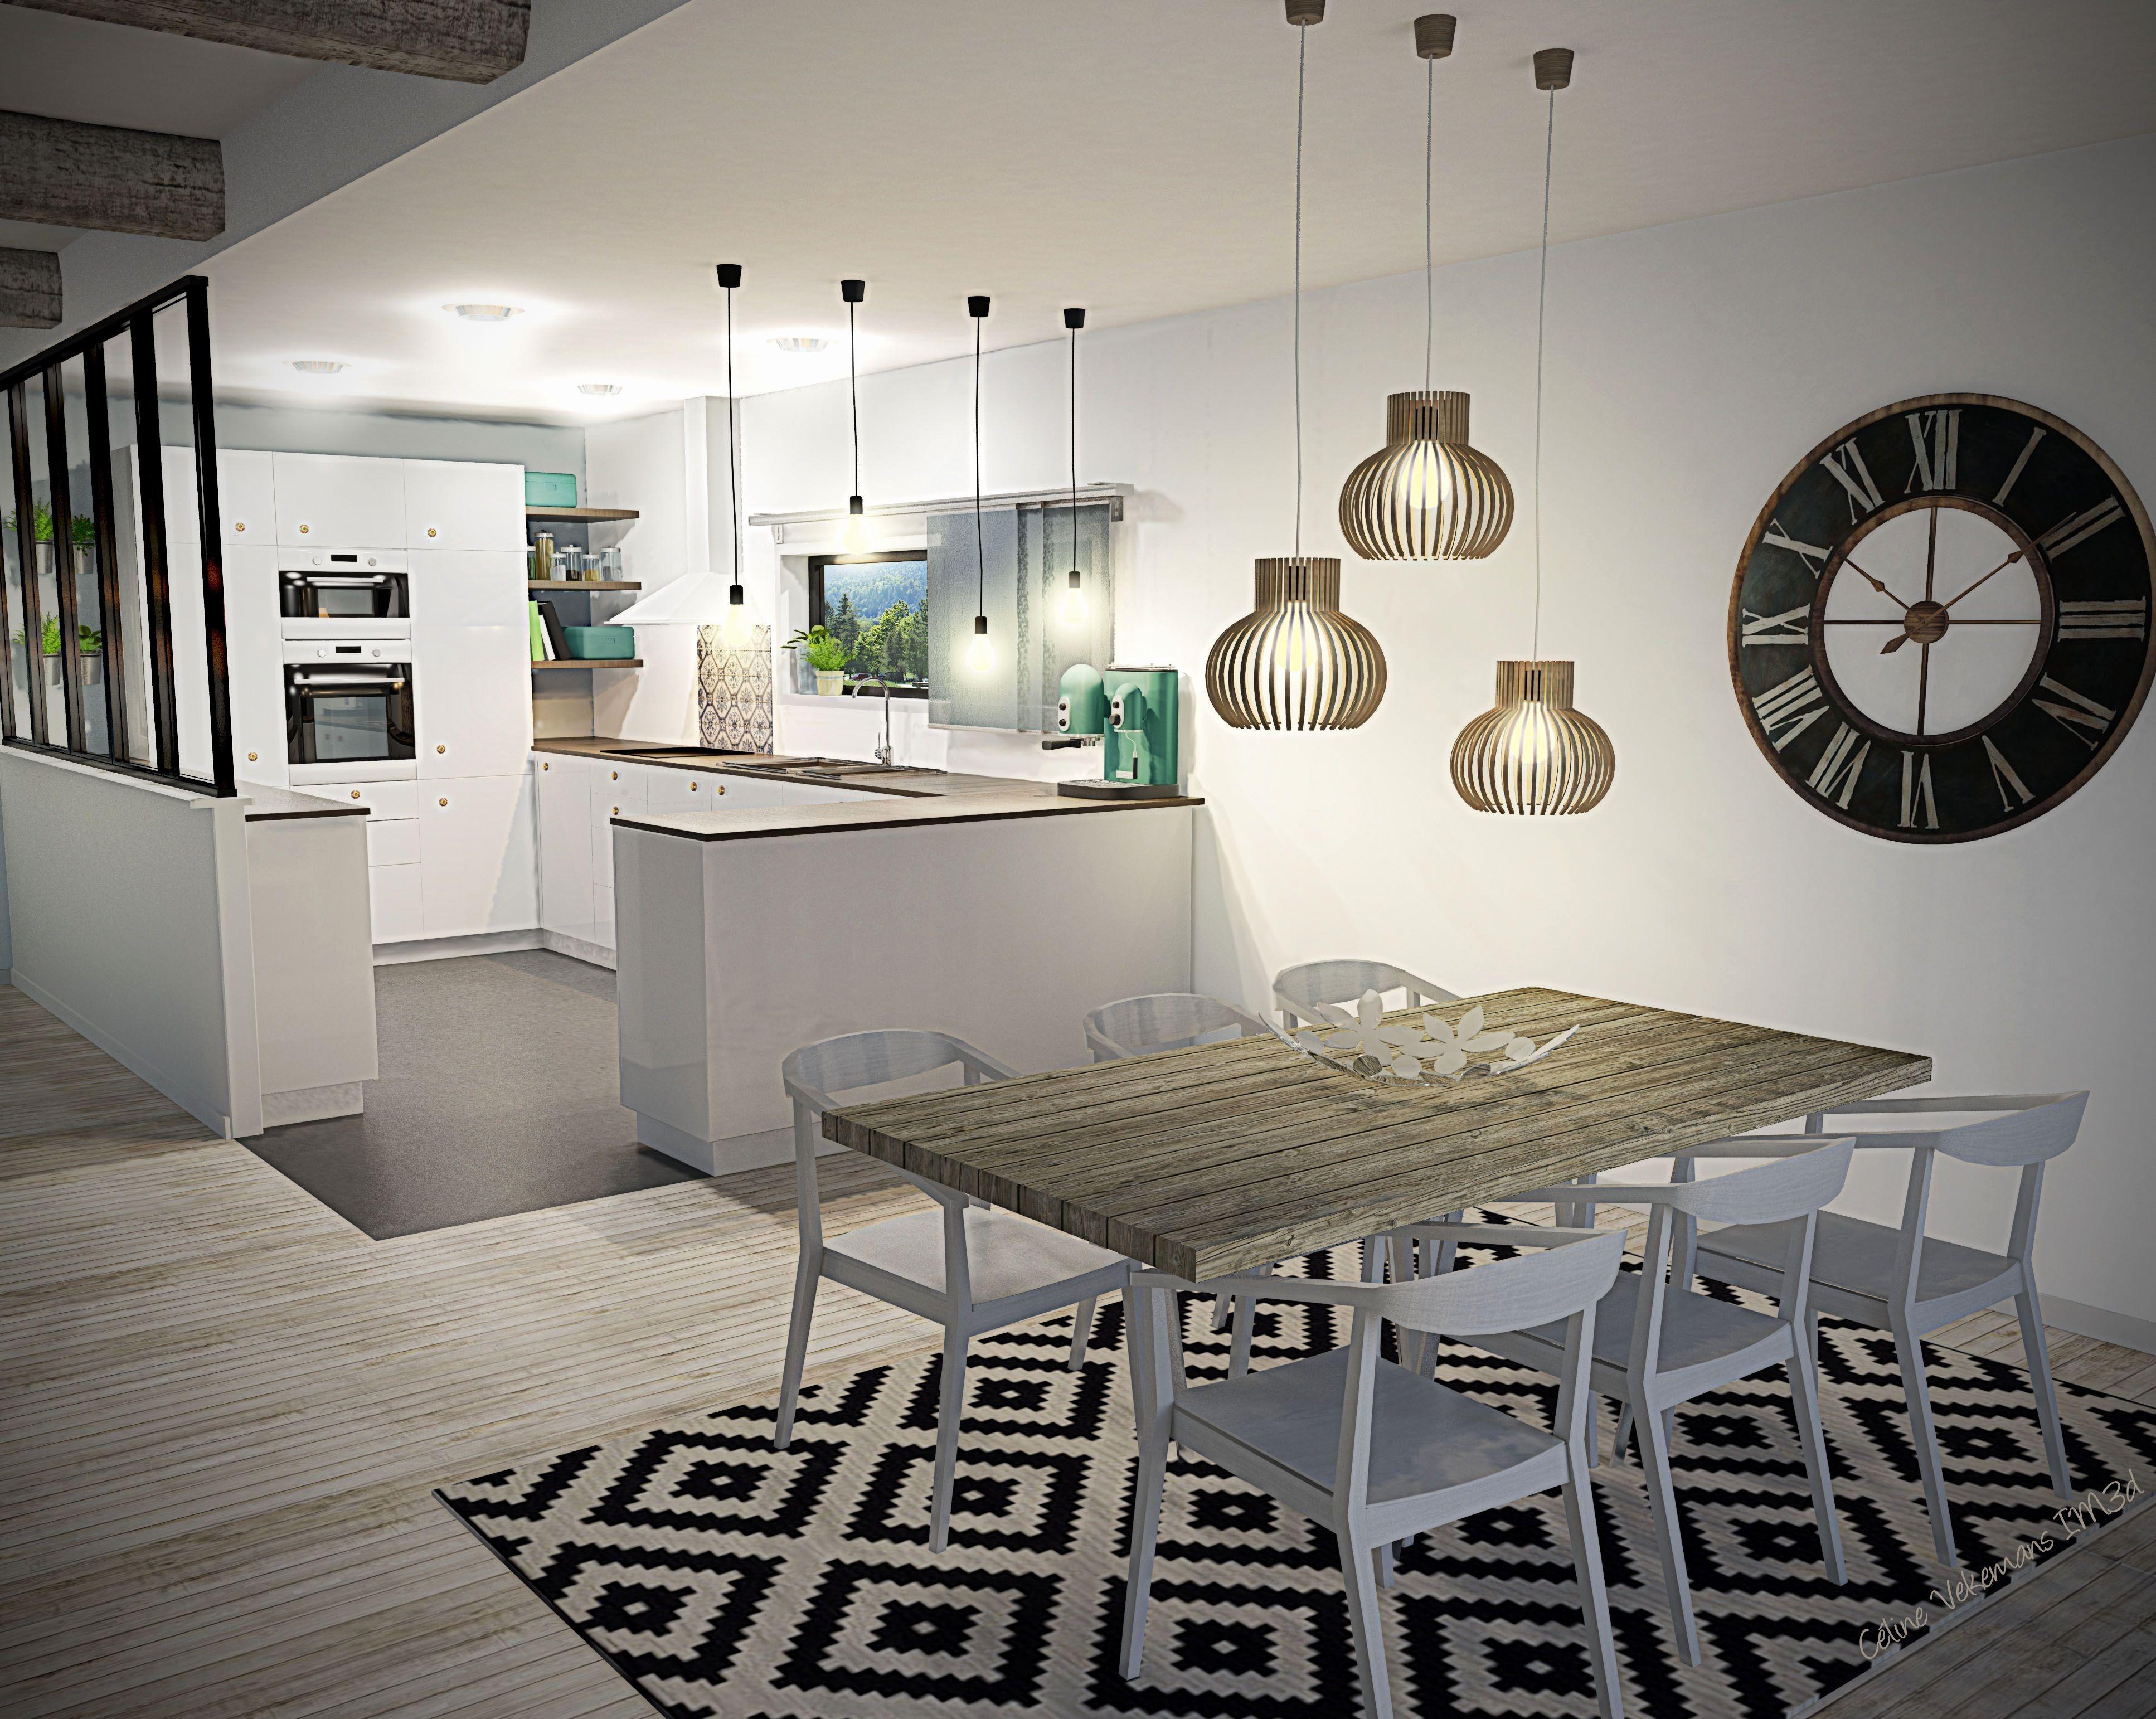 72 Inspirant Photographie De Tapis Bain Ikea 1000 Maison